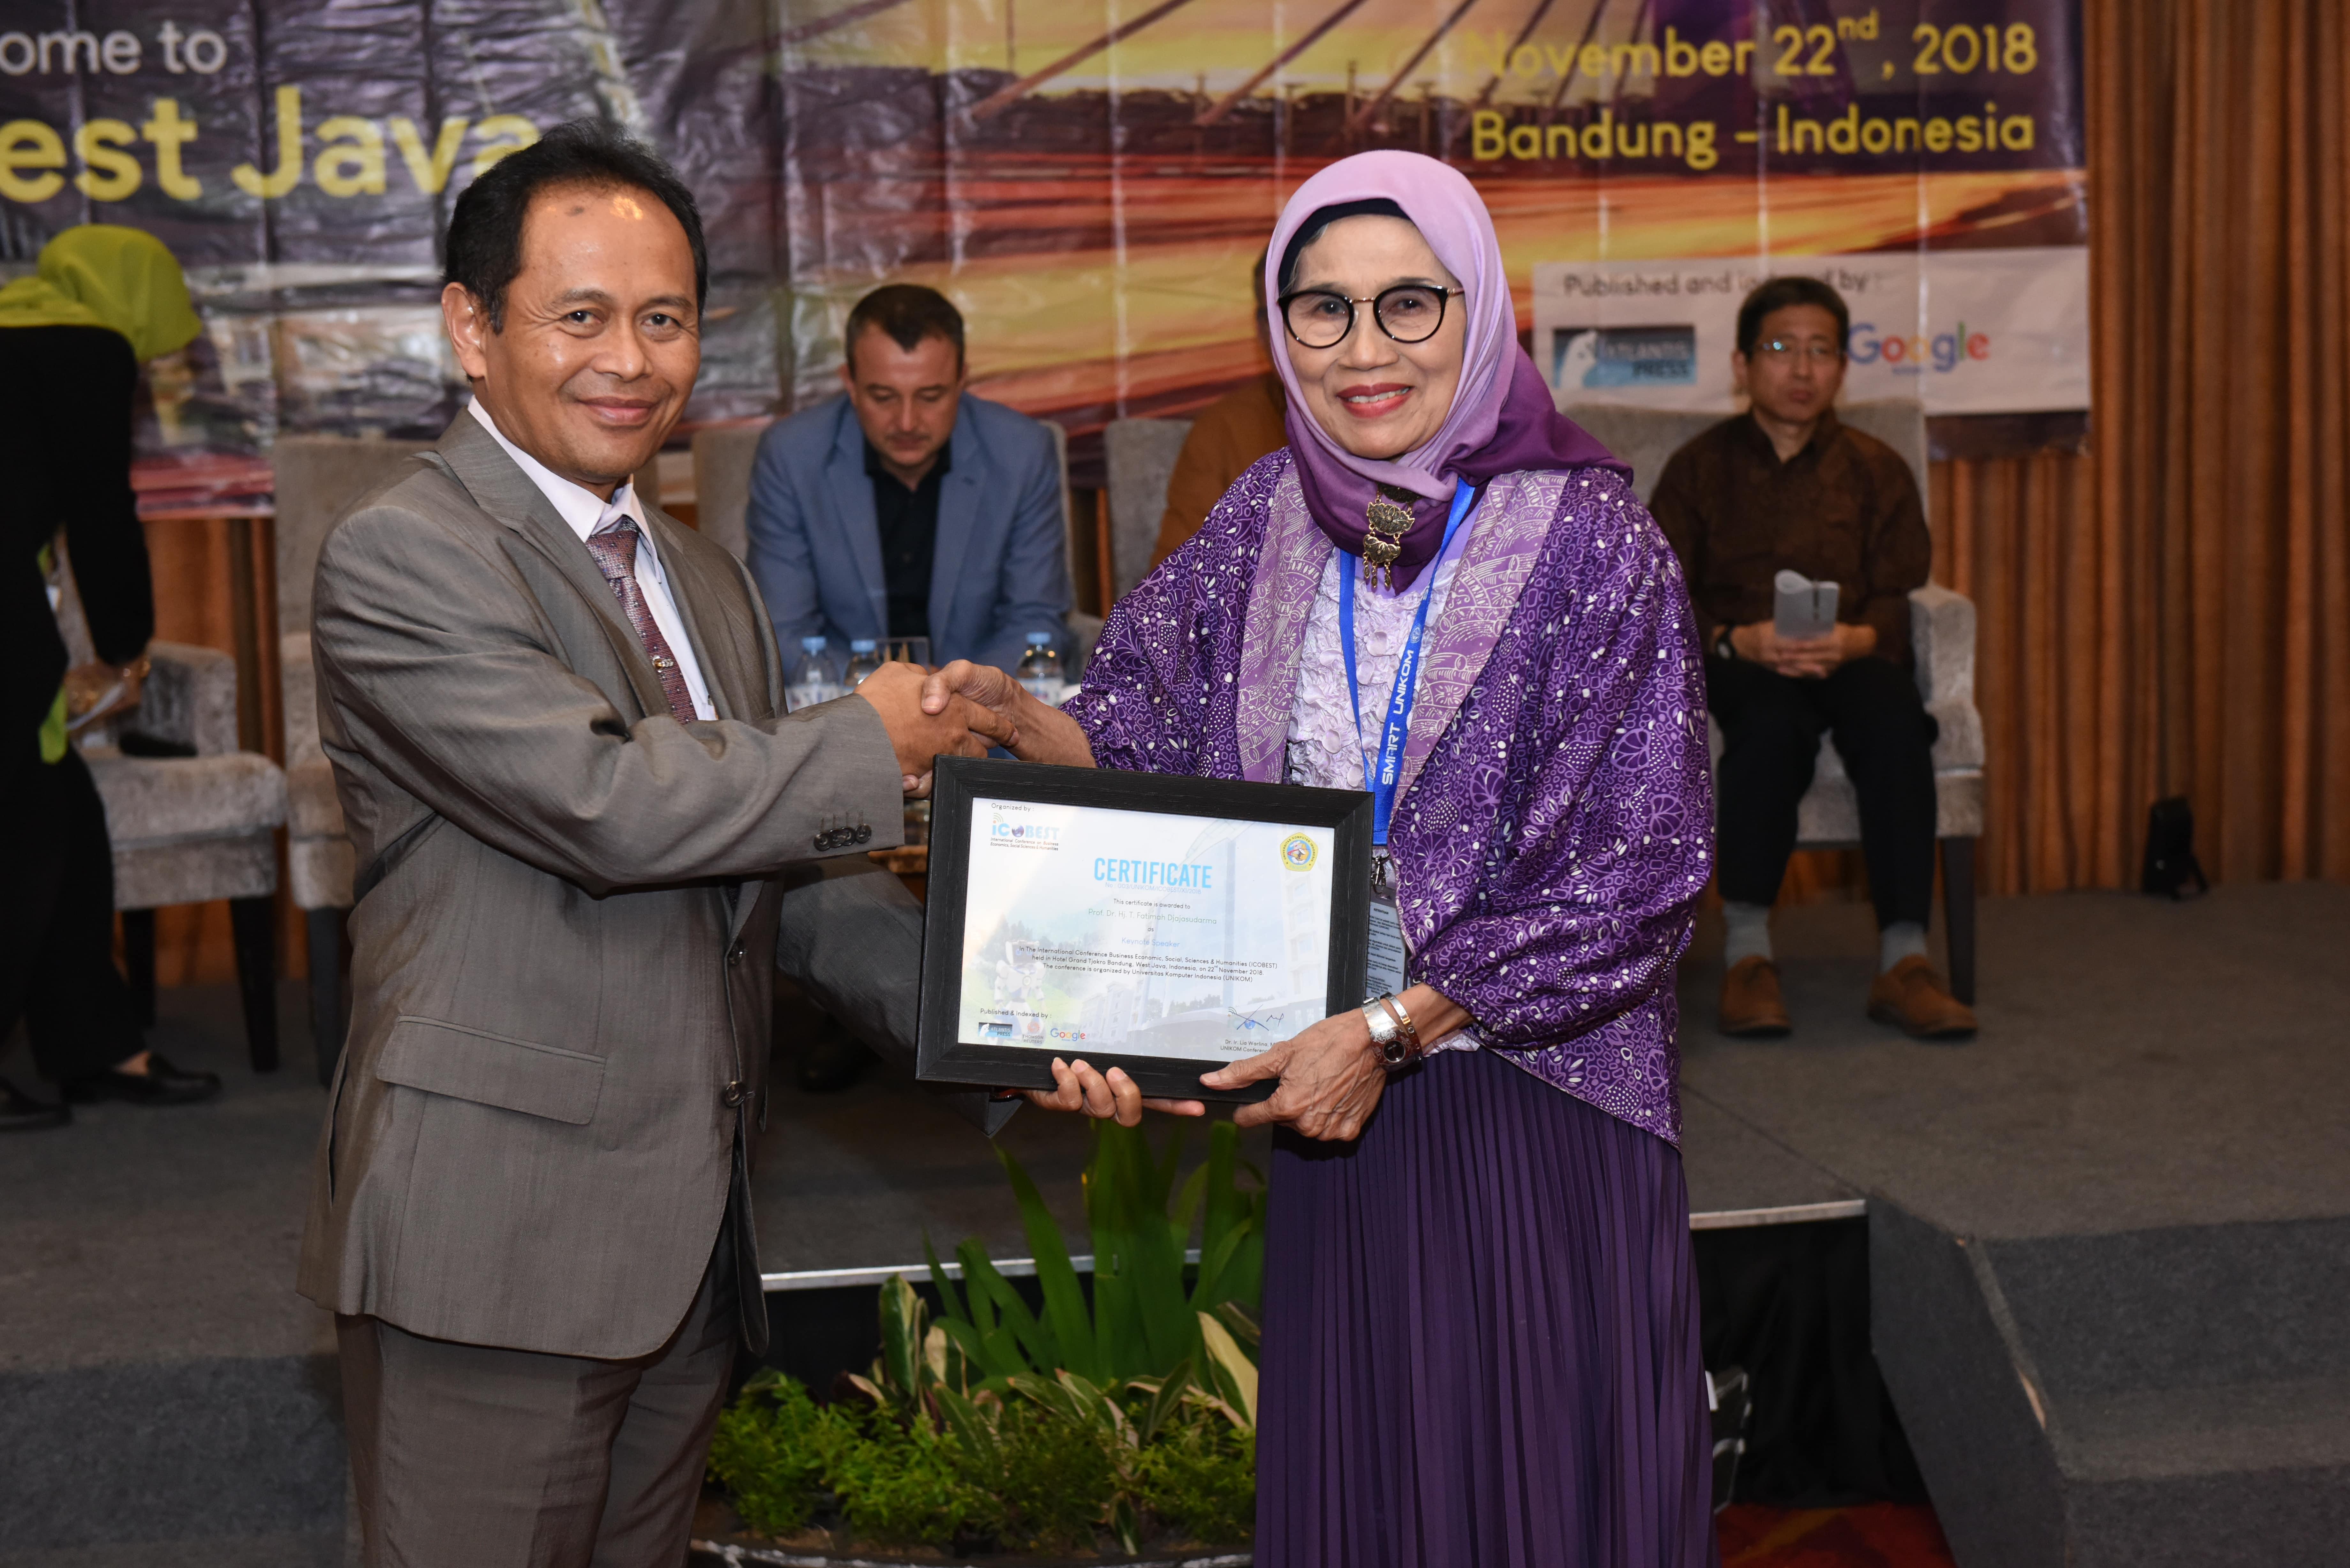 ICOBEST 2018 - Foto Bersama Prof. Dr. Hj. T. Fatimah Djajasudarma